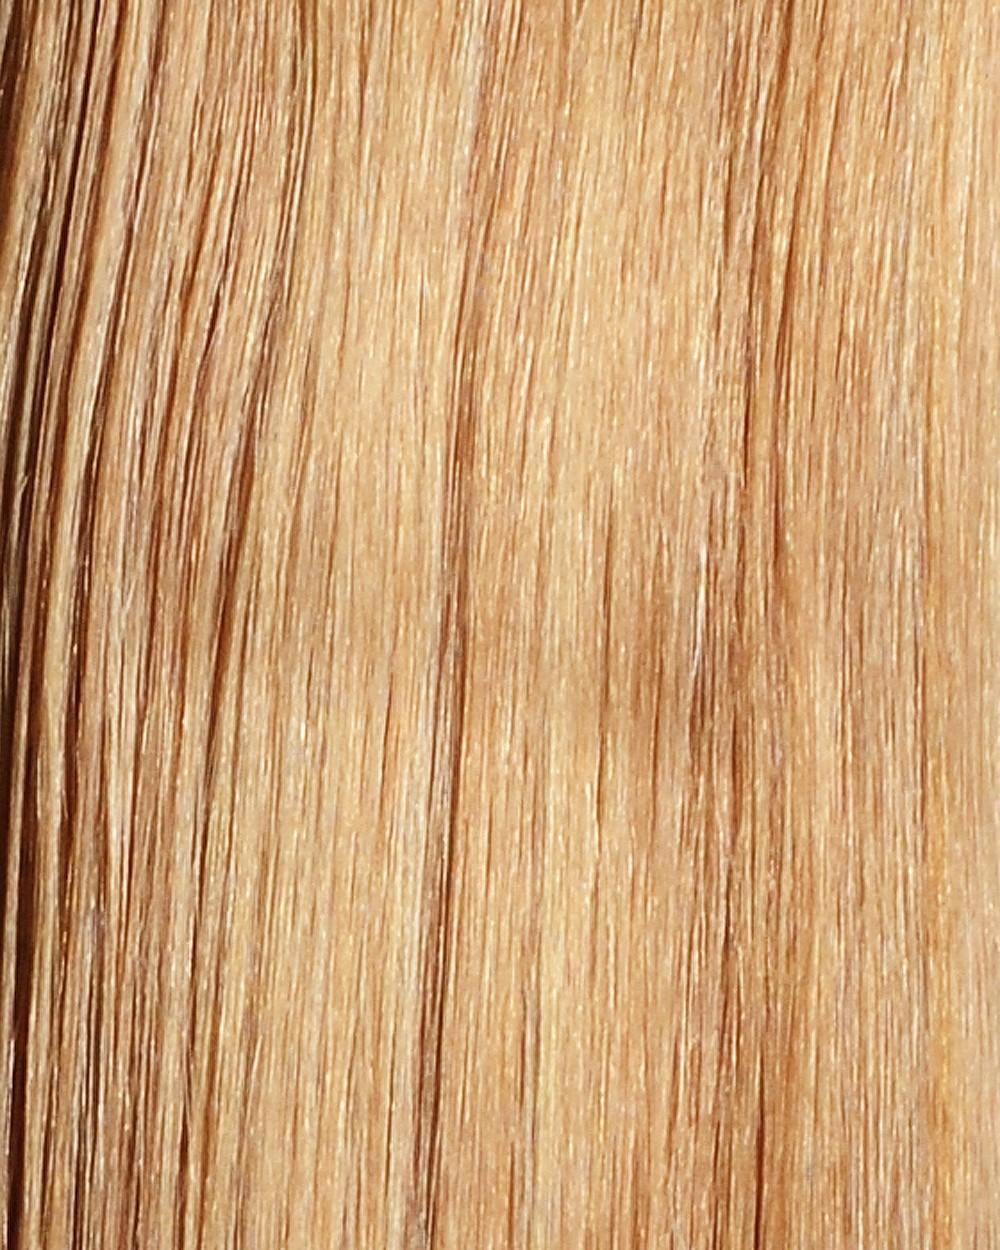 Light Ash Brown Ash Blonde Pure Blonde Mix (12-16-613)